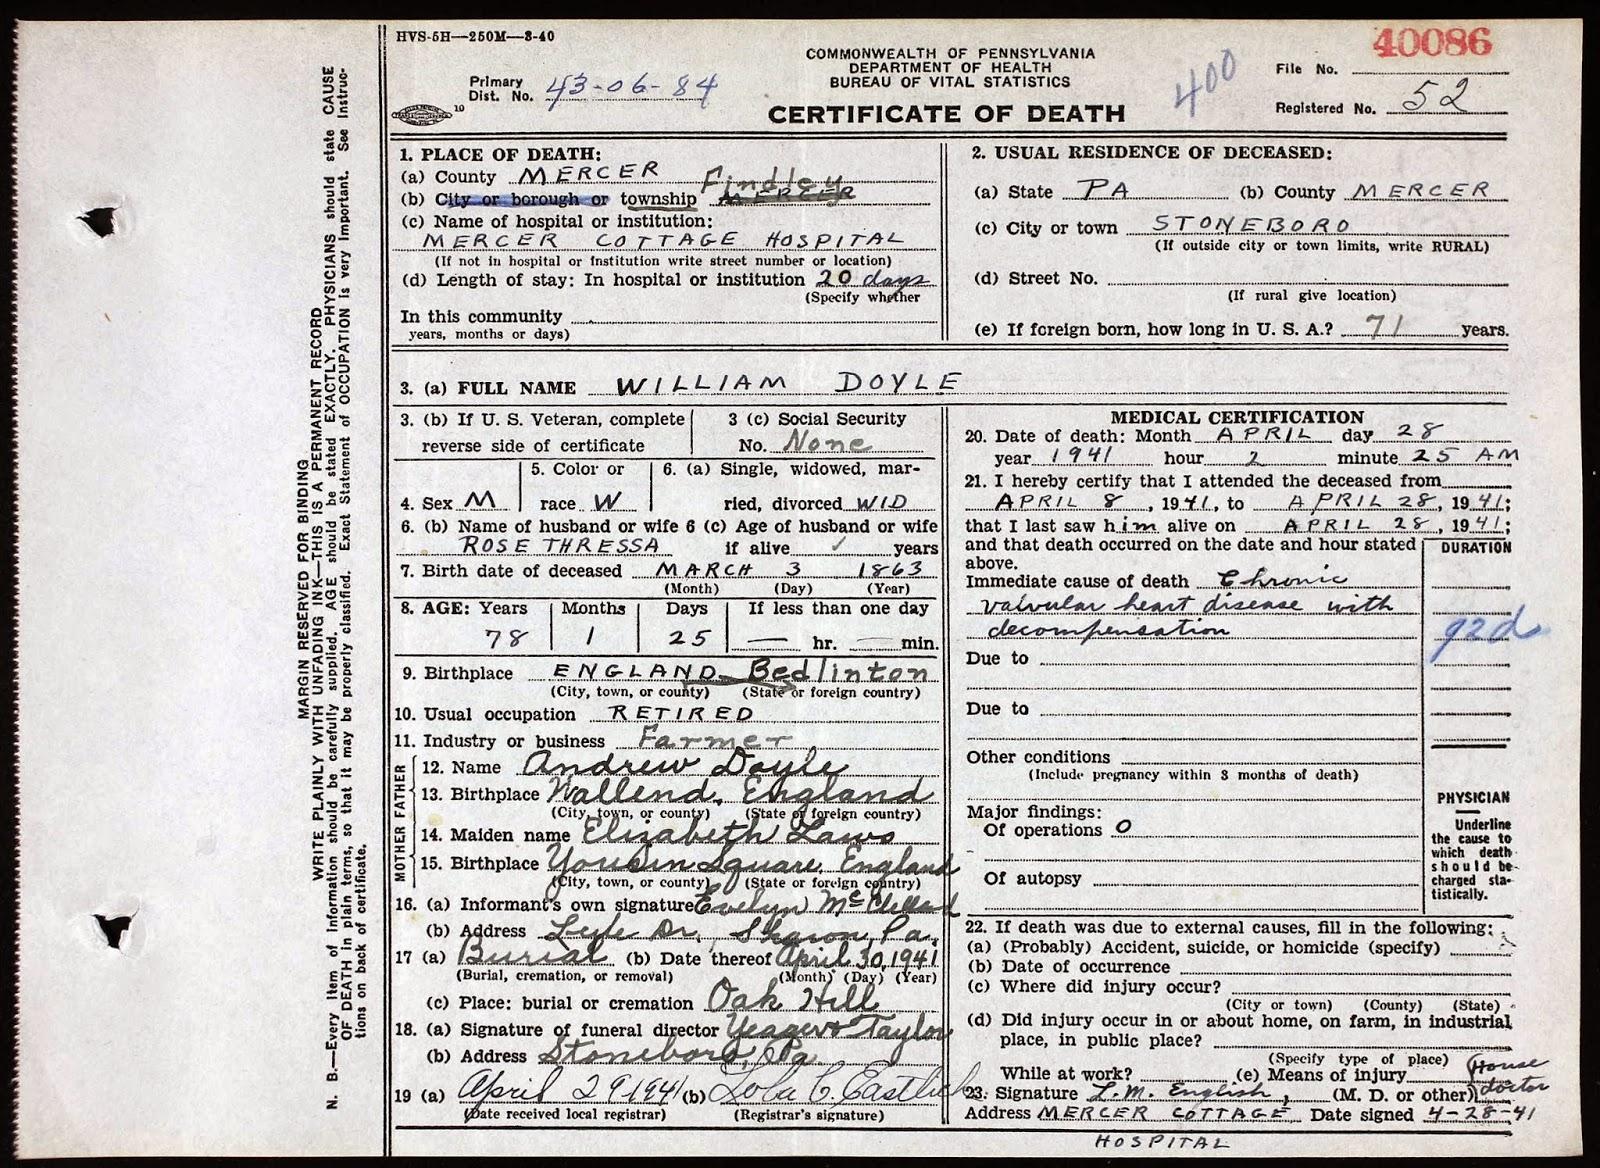 Pennsylvania bureau of vital statistics death certificates